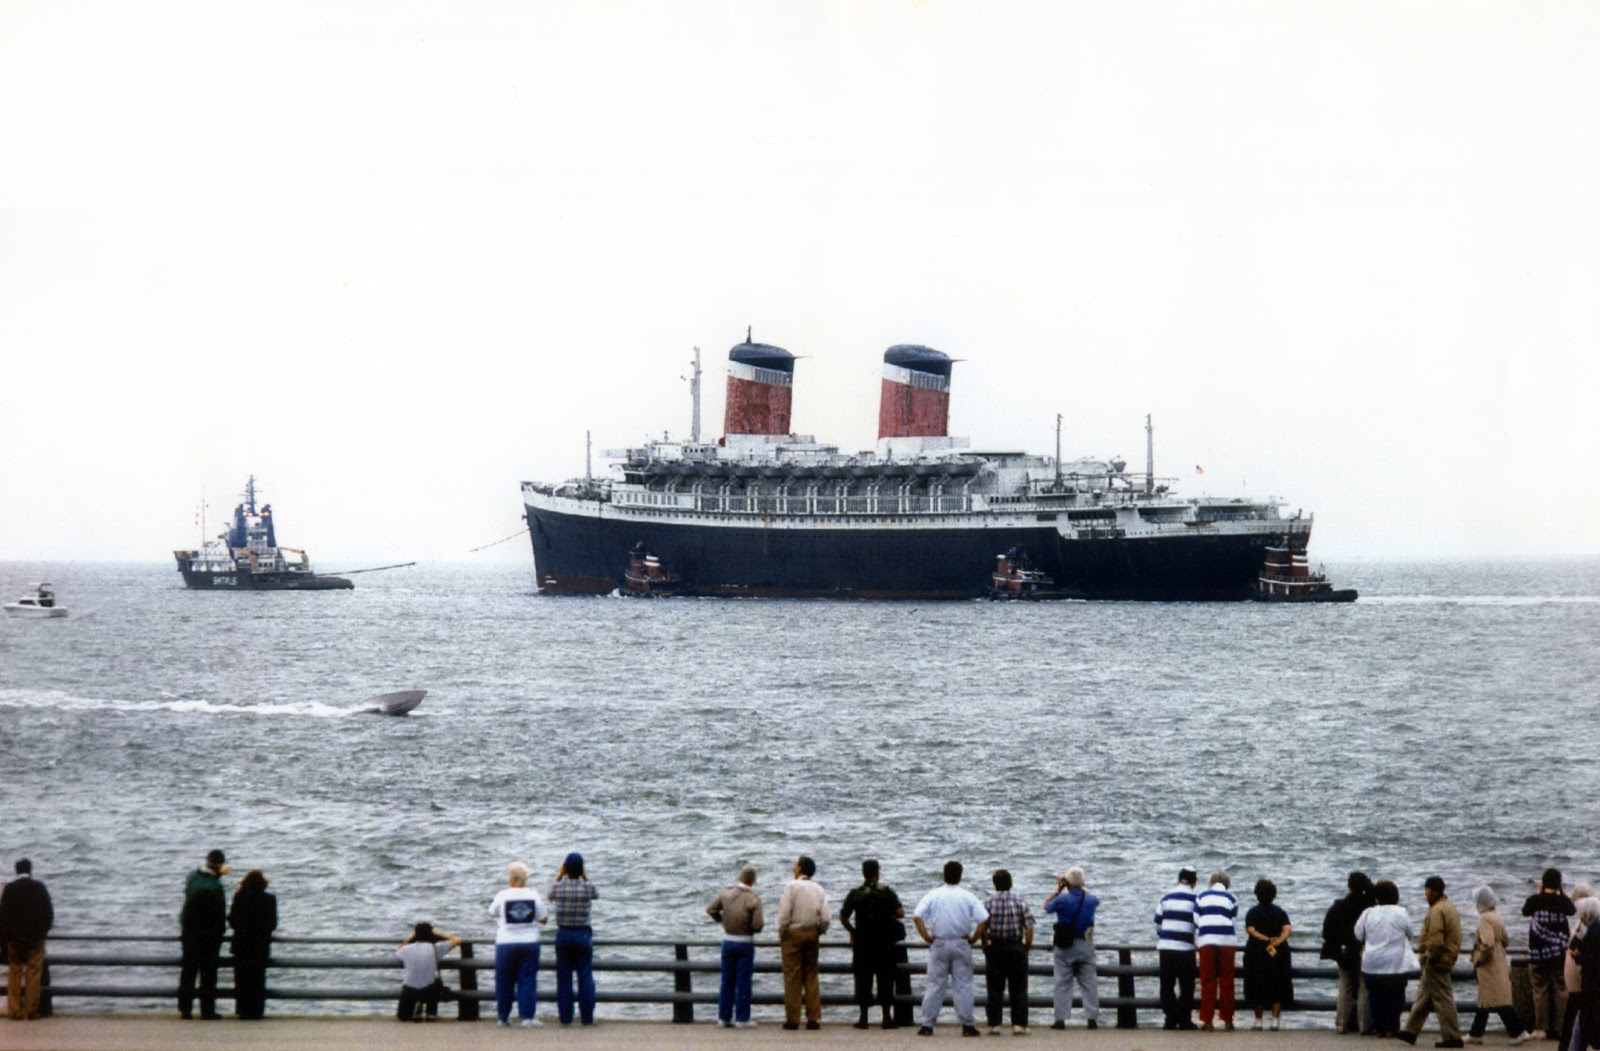 SS United States departing Norfolk, Virginia, under tow bound for Turkey, June 1992.